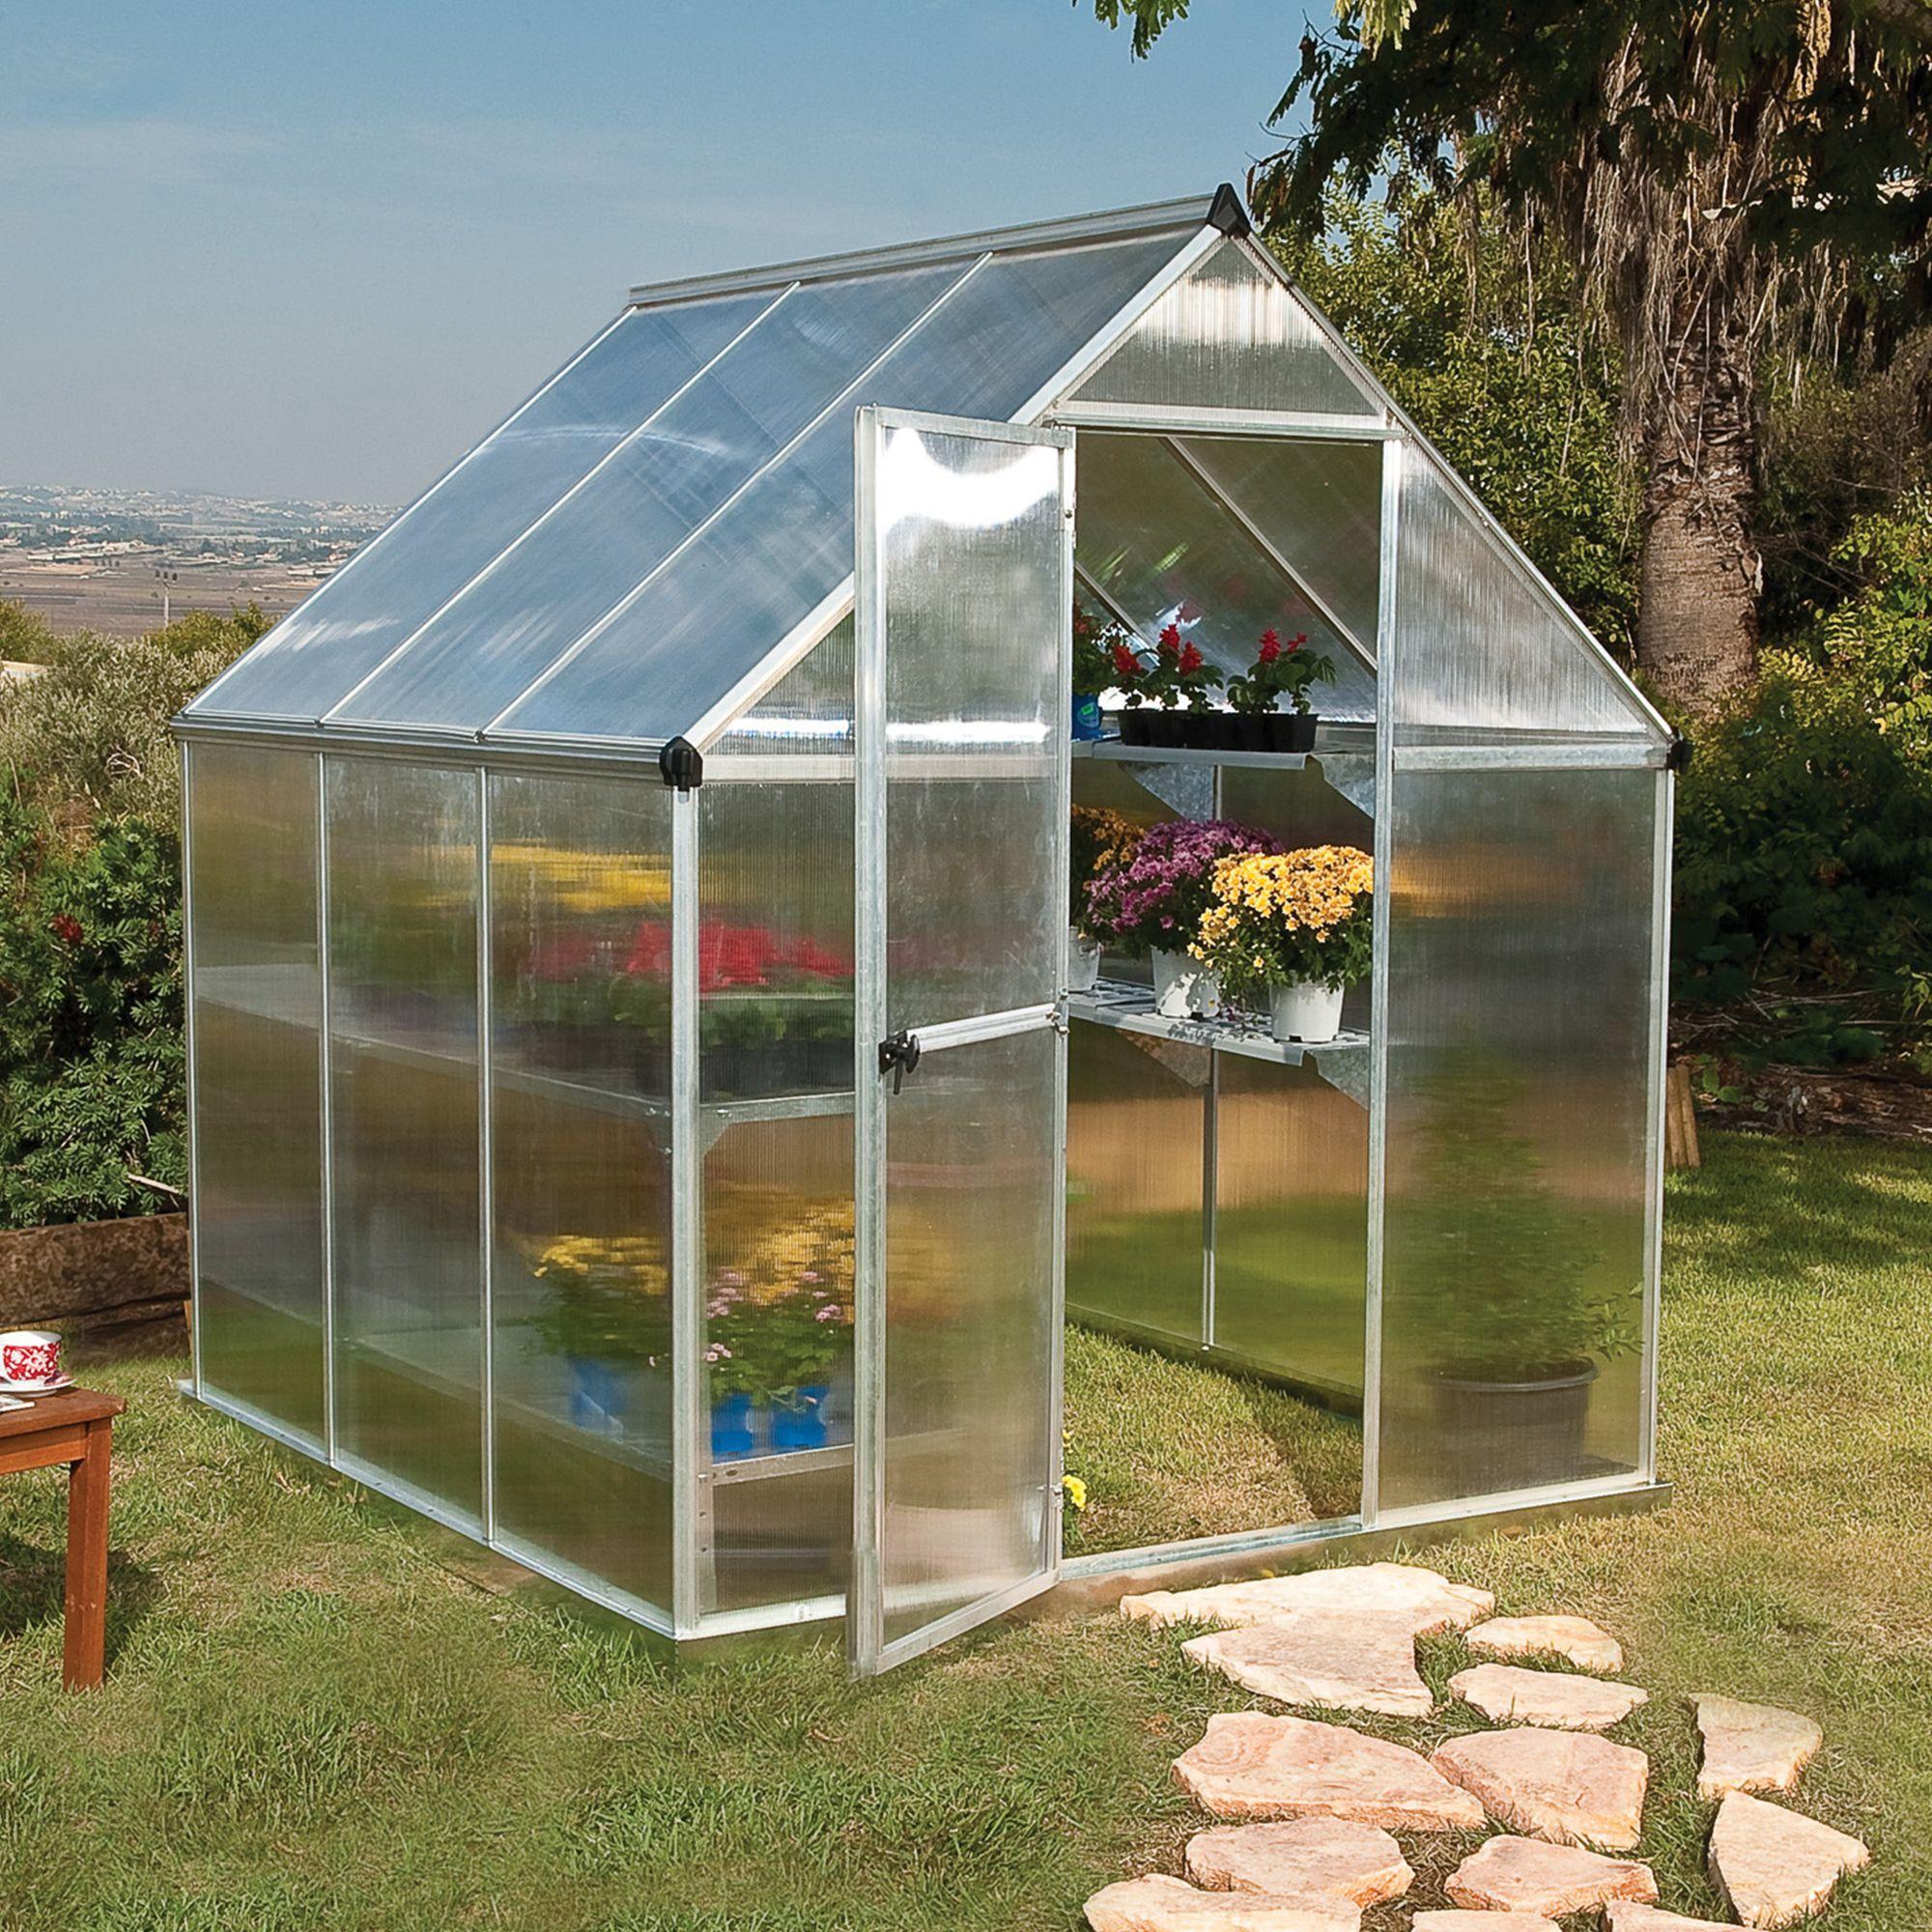 Palram Mythos 6x6 Polycarbonate Apex Greenhouse